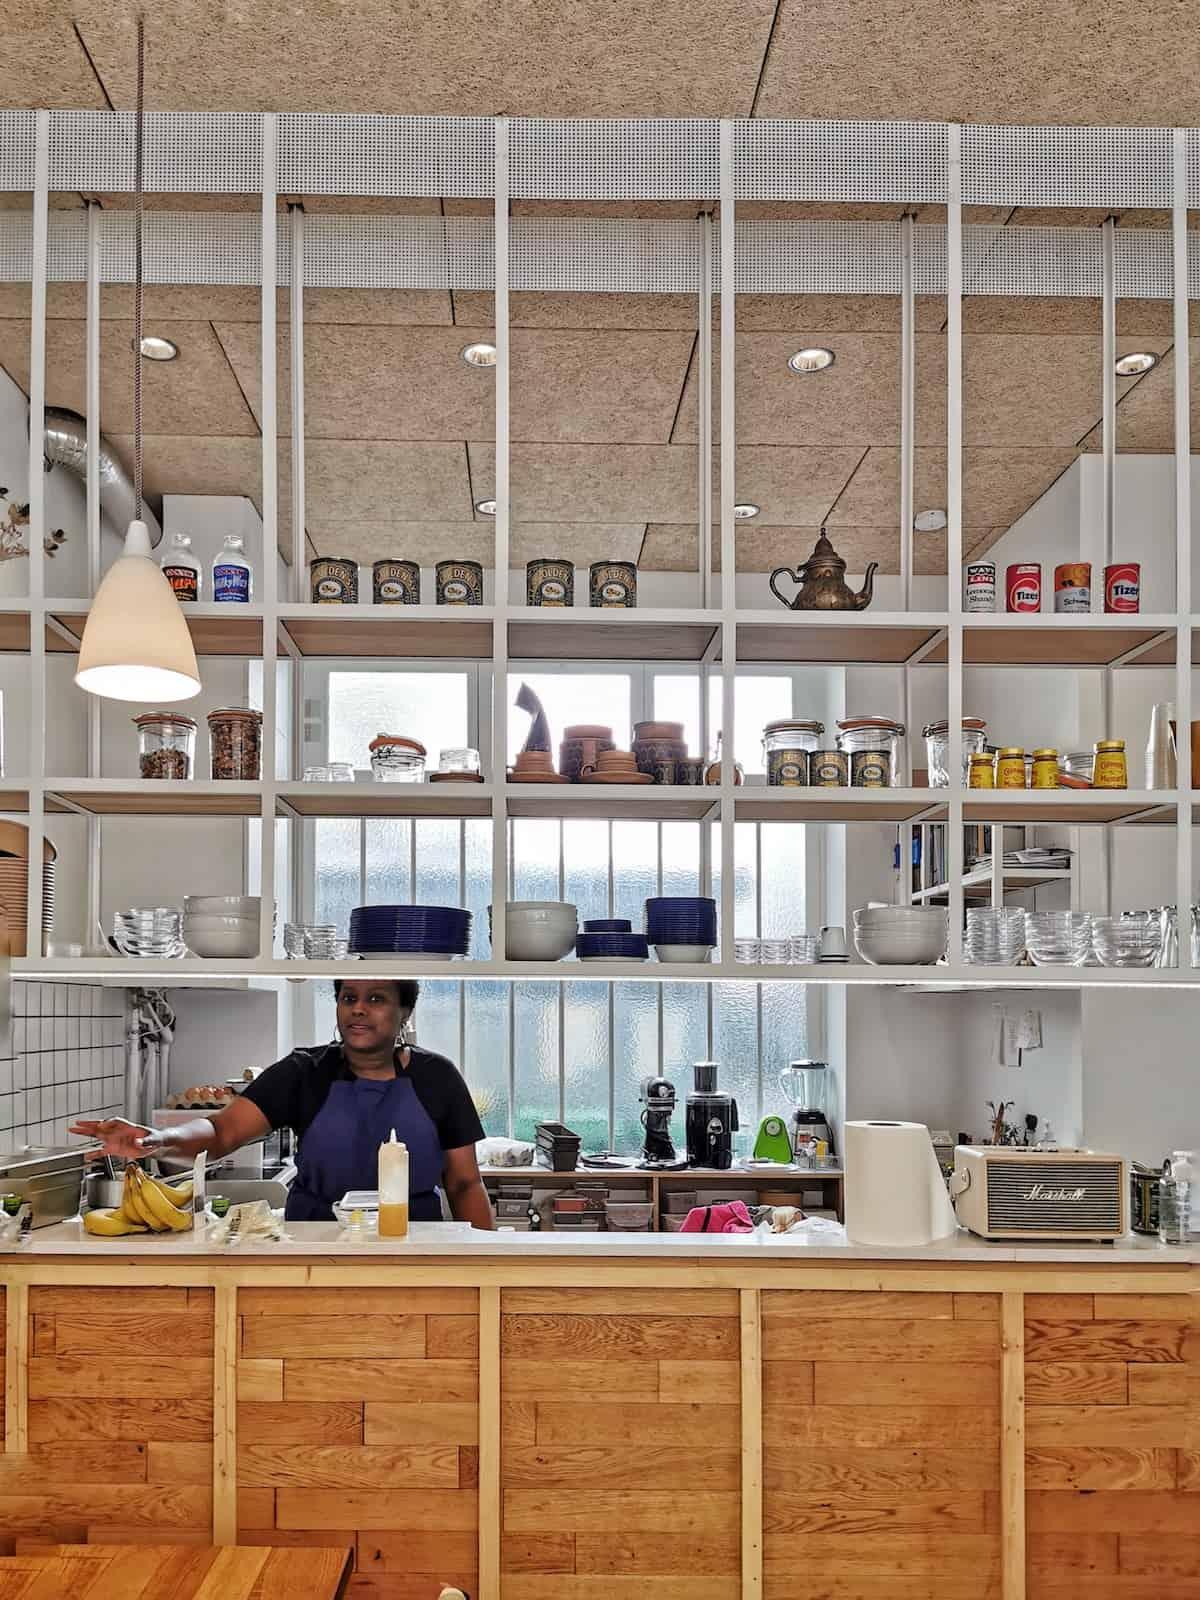 the-kursaal-coffee-shop-wifo-restaurant-paris-12-e-nation.jpeg